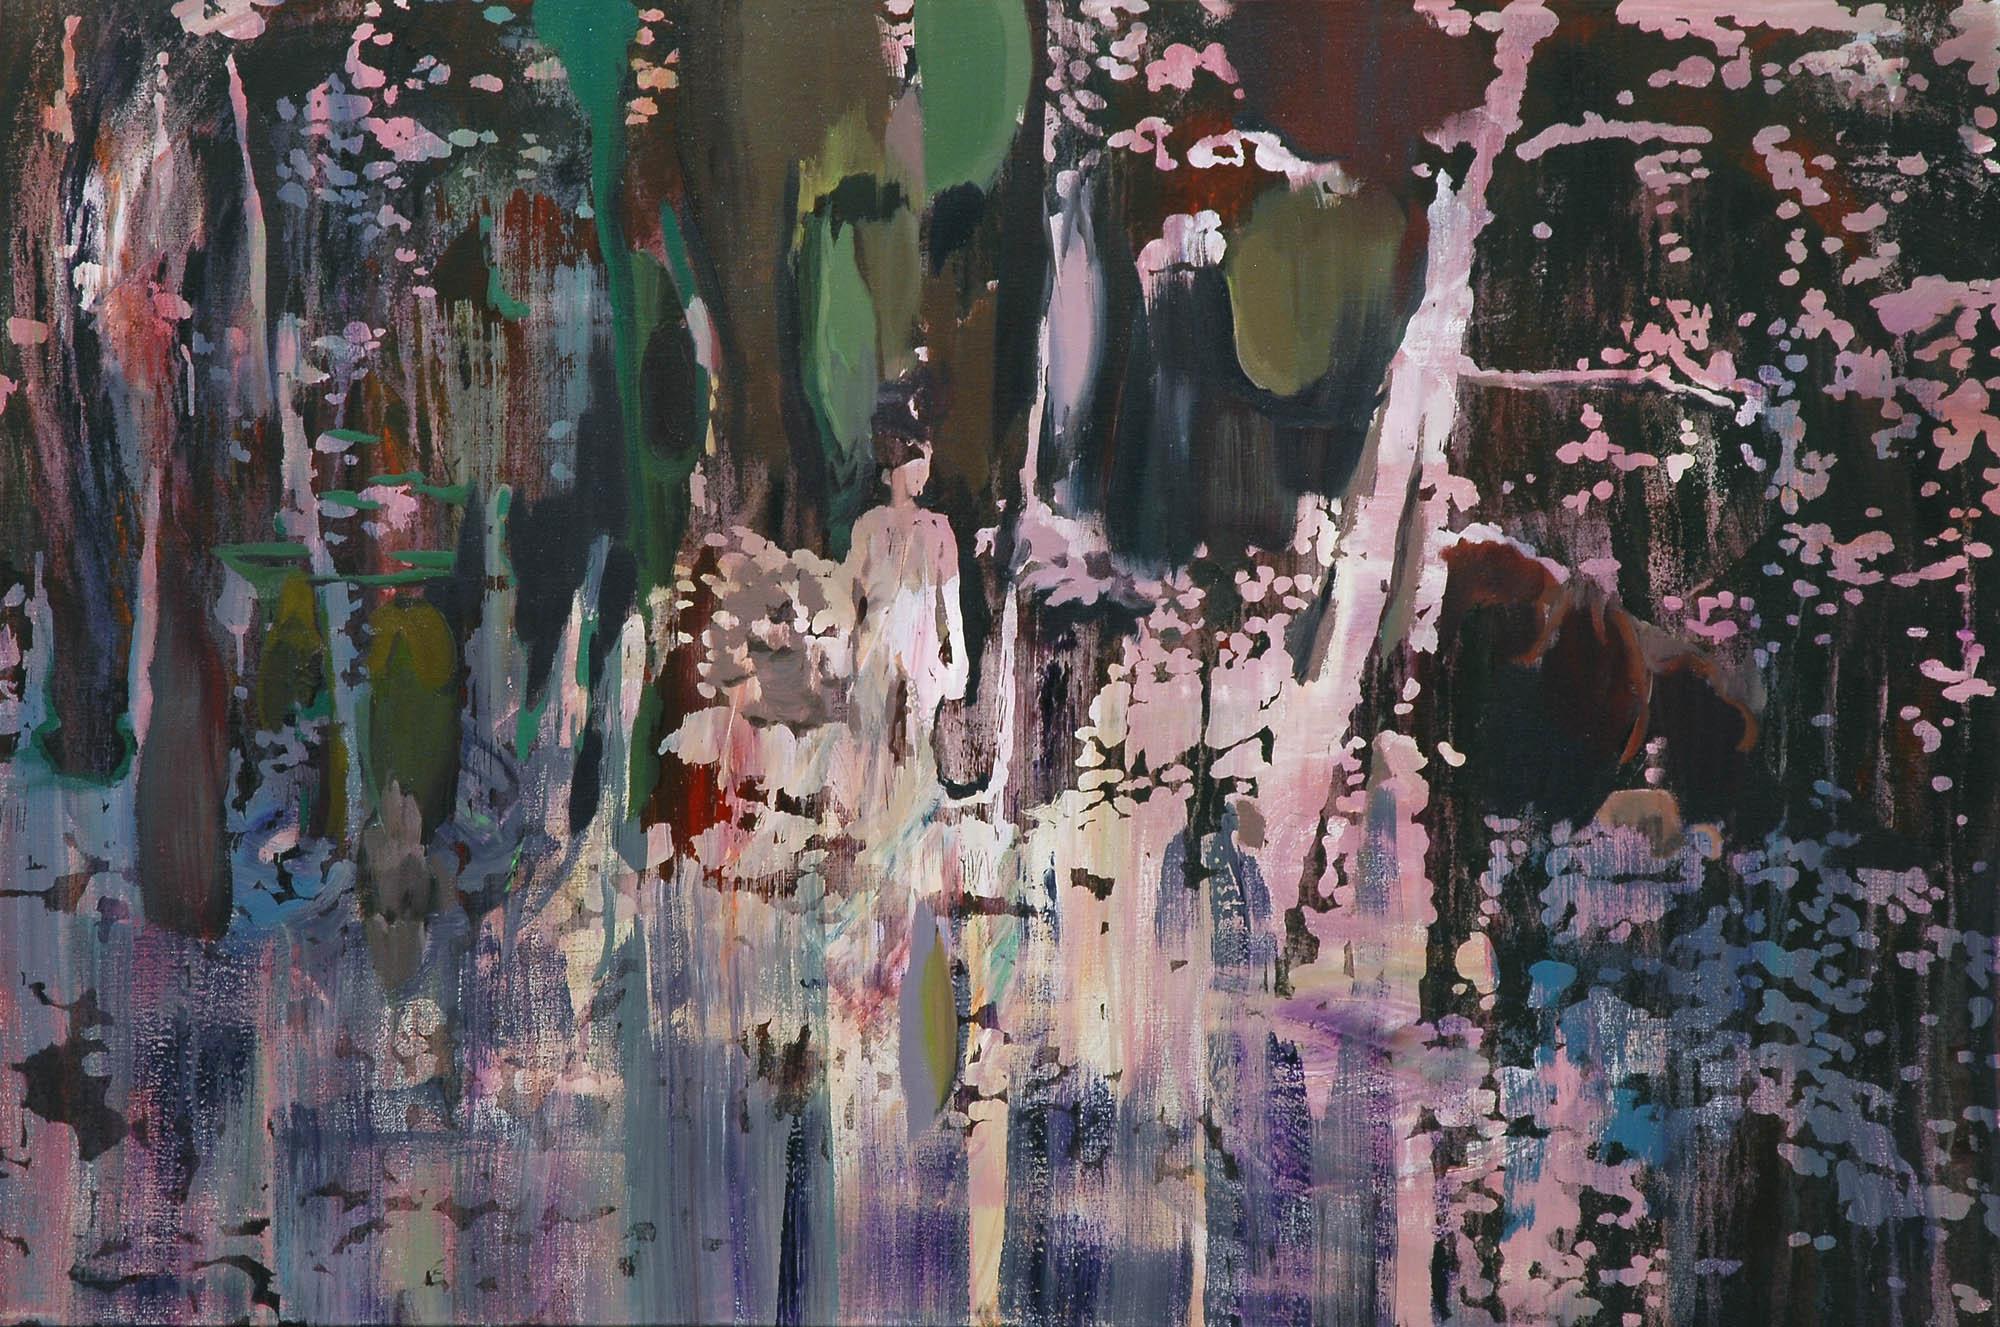 Lu Song 吕松, By the Feet of Aboriginal 跟随猎人的脚步, 2015, Oil on canvas 布面油画, 110 x 80 cm